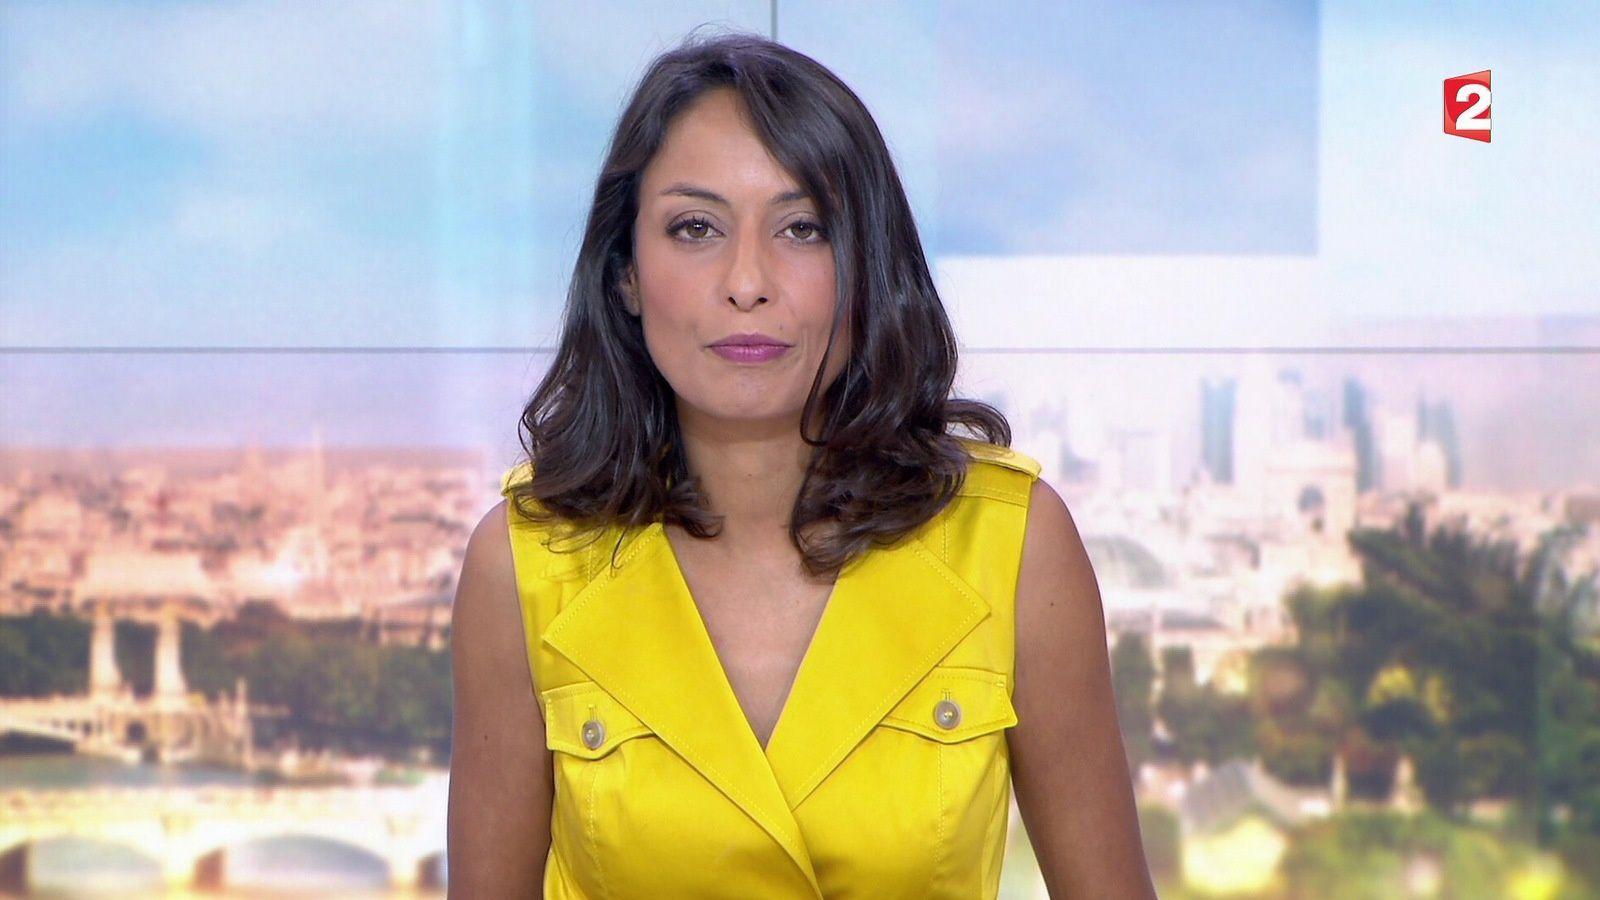 📸15 LEILA KADDOUR @Leilakan ce soir pour LE 13H WEEK-END @France2tv #vuesalatele